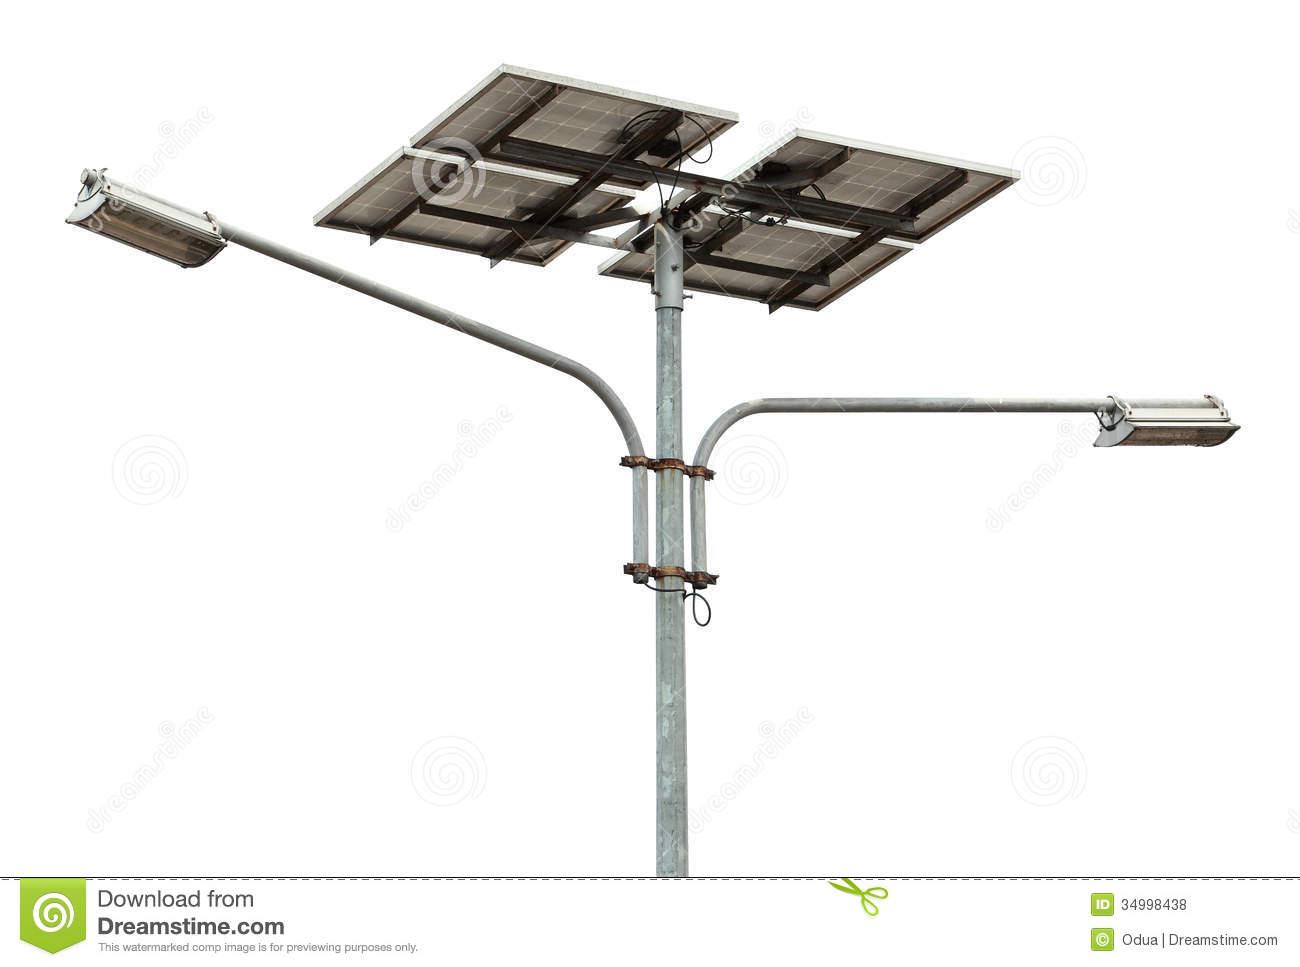 Solar Powered Street Light Royalty Free Stock Image.